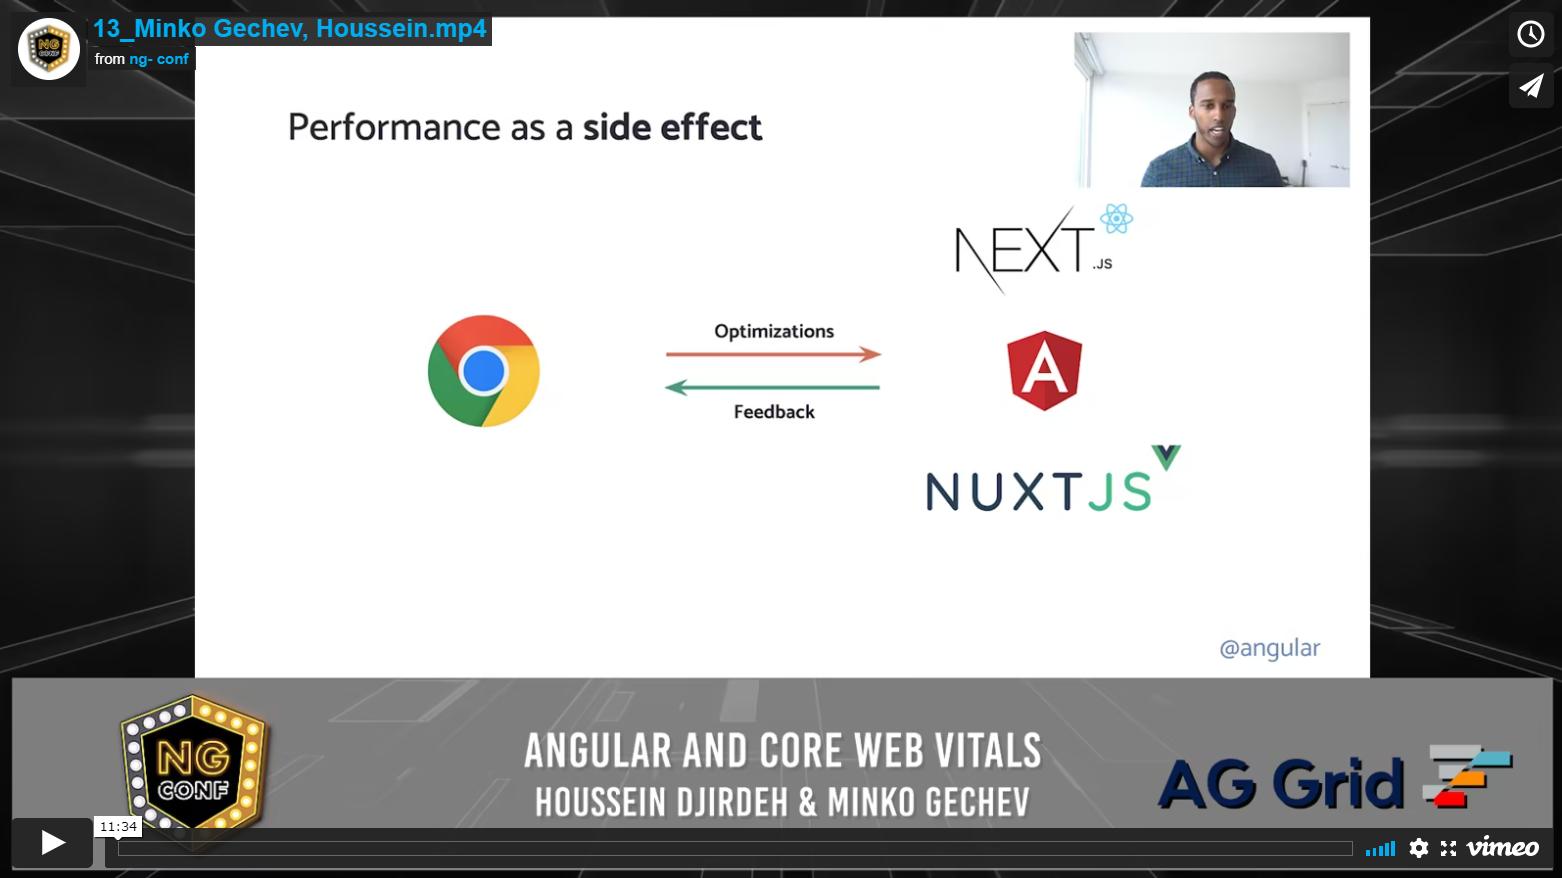 Angular and Core Web Vitals